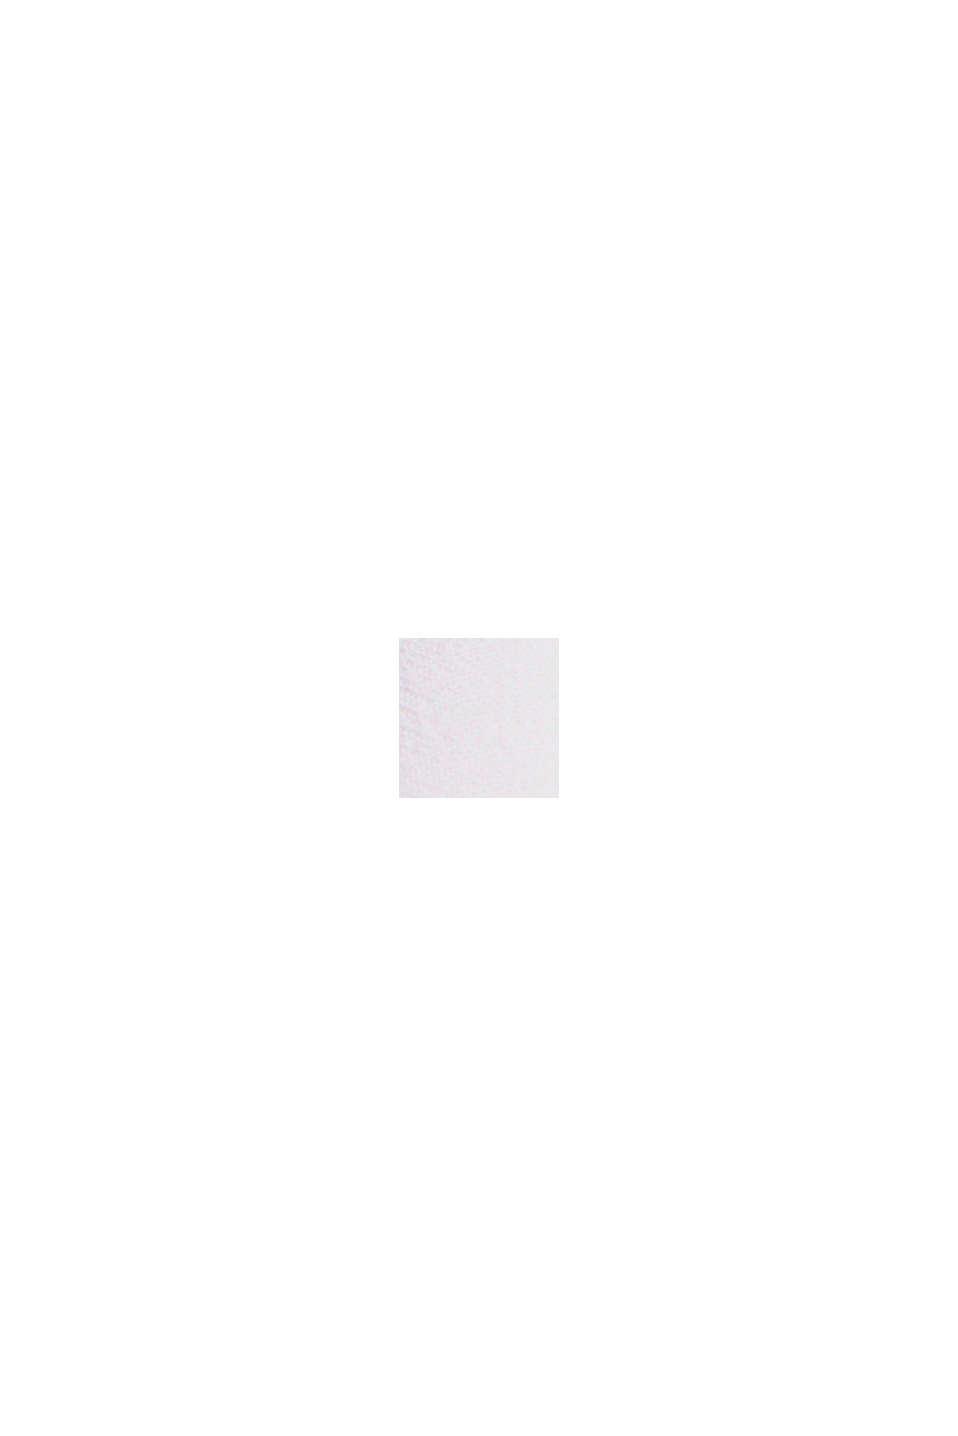 Blusentop mit Schleife, LENZING™ ECOVERO™, WHITE, swatch